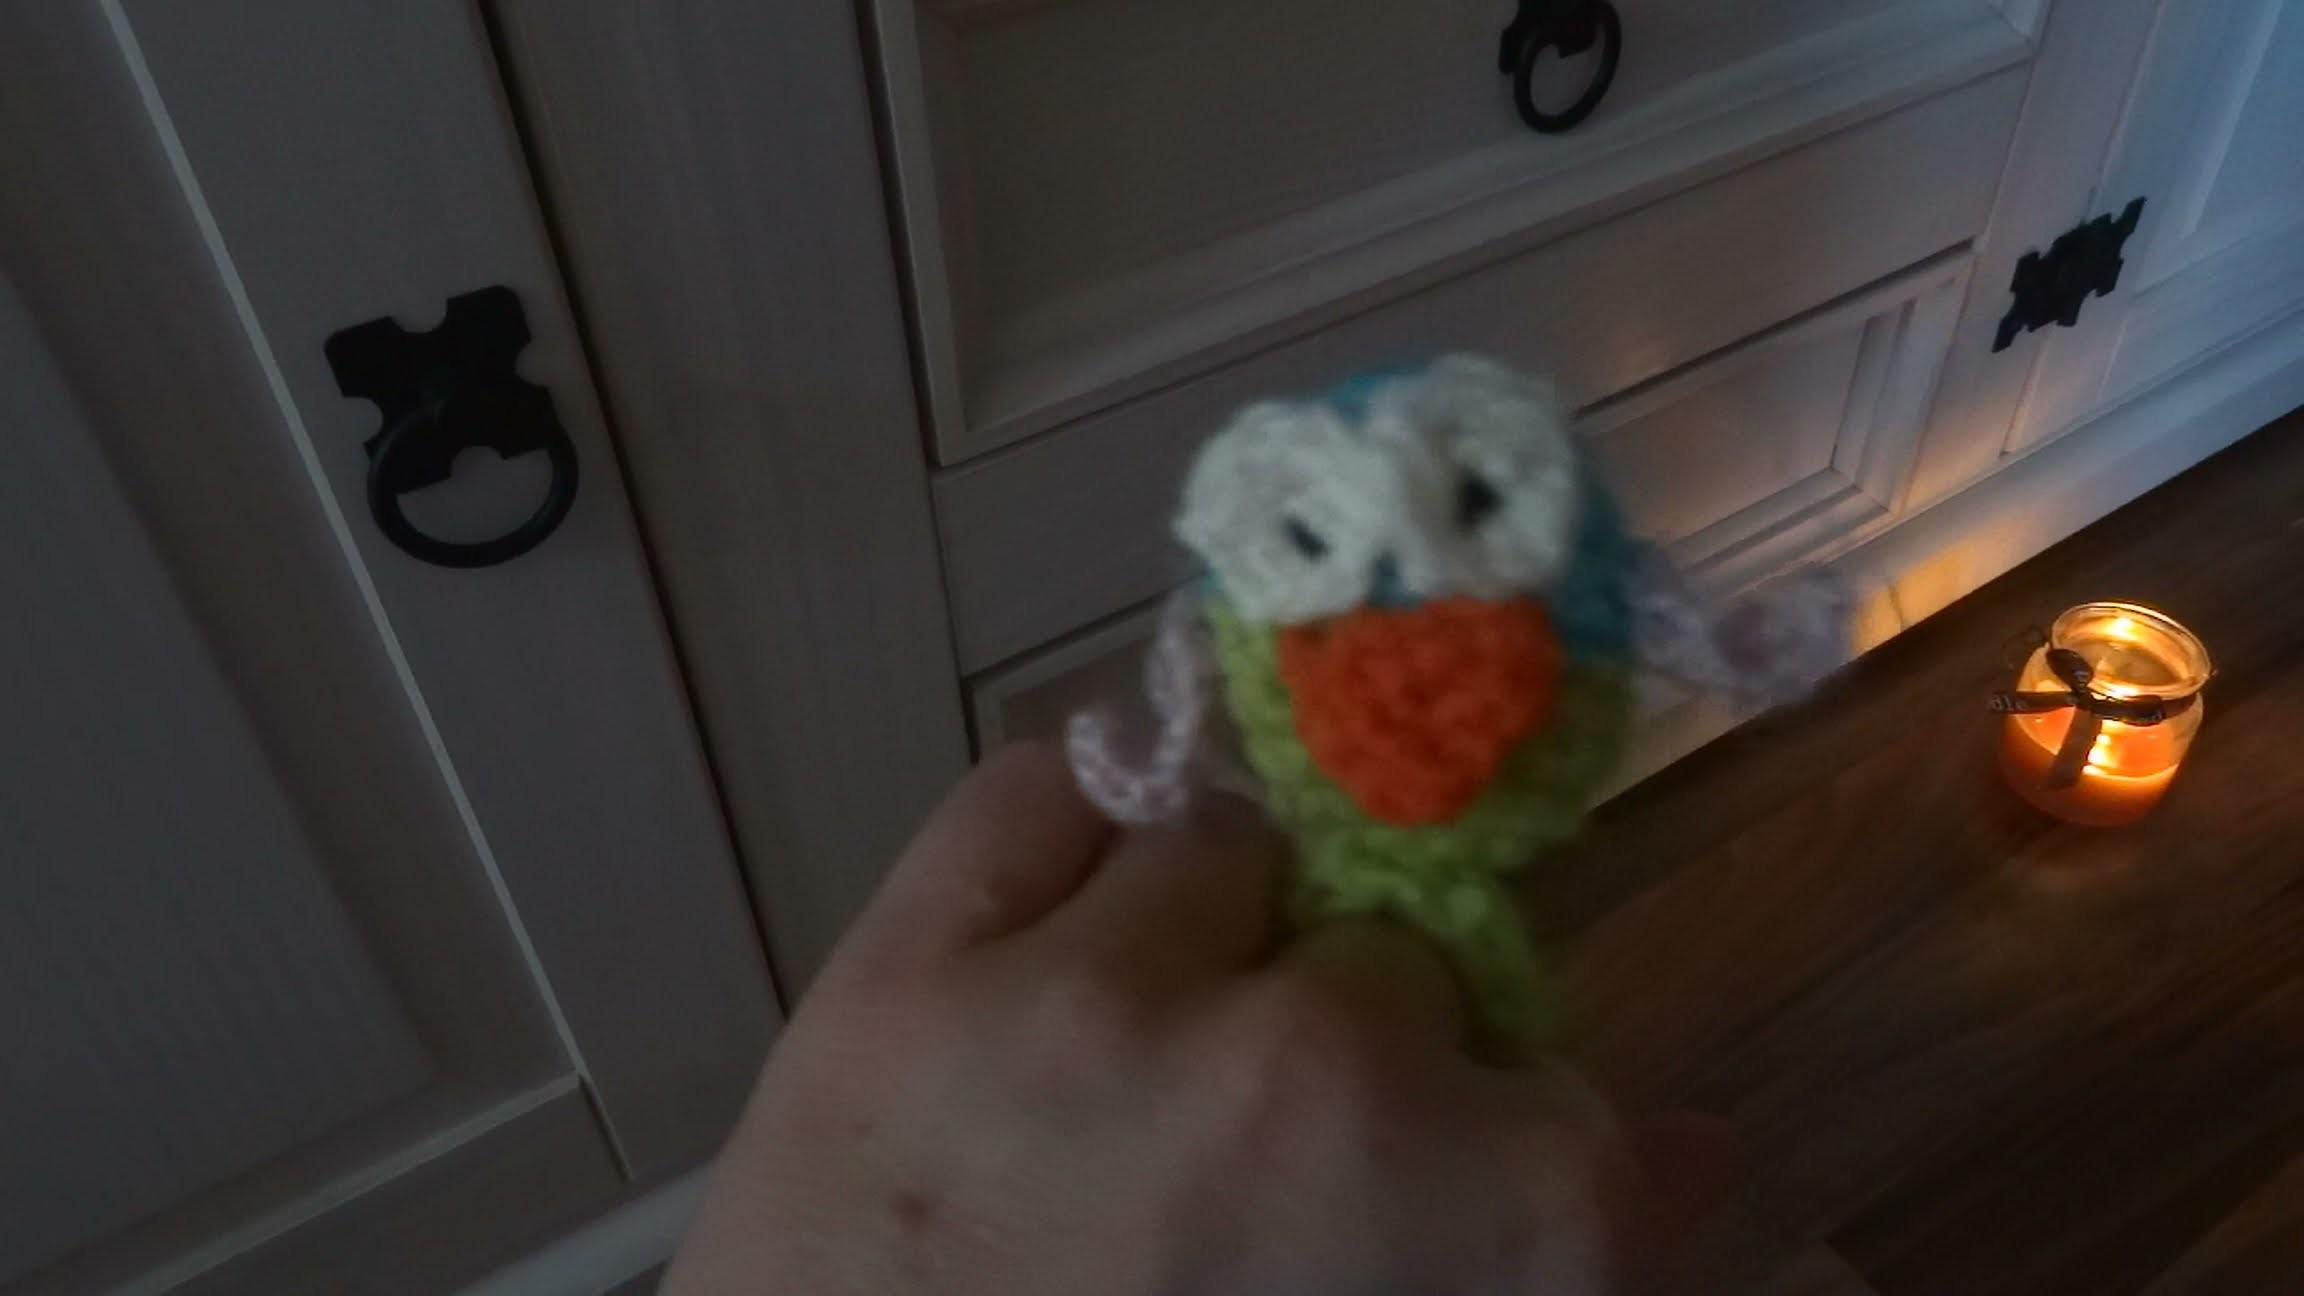 DIY Fingerpuppe Eule - Babyspielzeug selber häkeln Teil 1 - Amigurumi